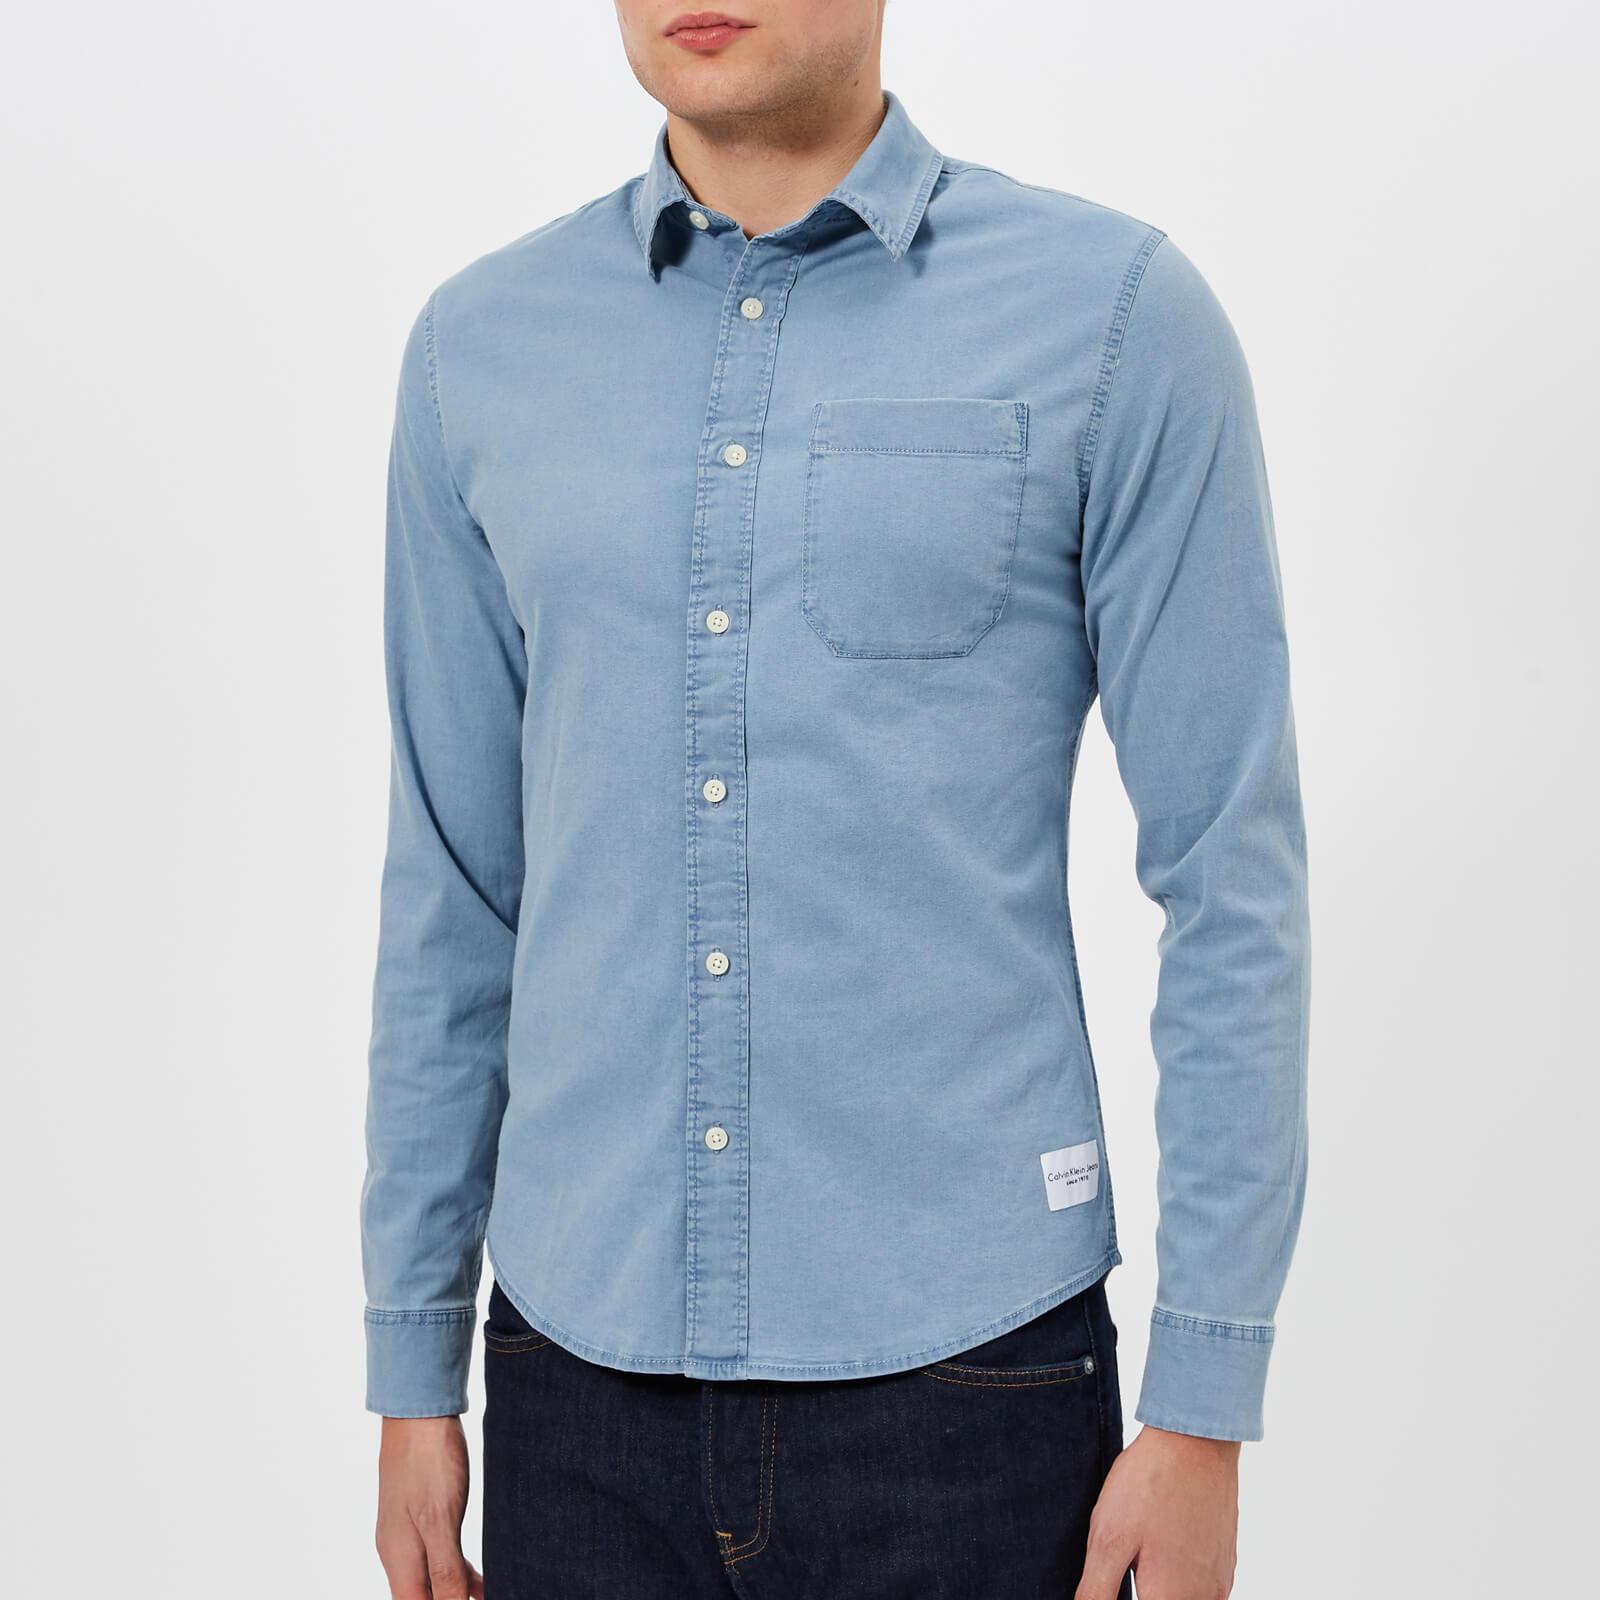 69a97761df Calvin Klein Men s Wilbens Denim Shirt - Light Indigo Mens Clothing ...